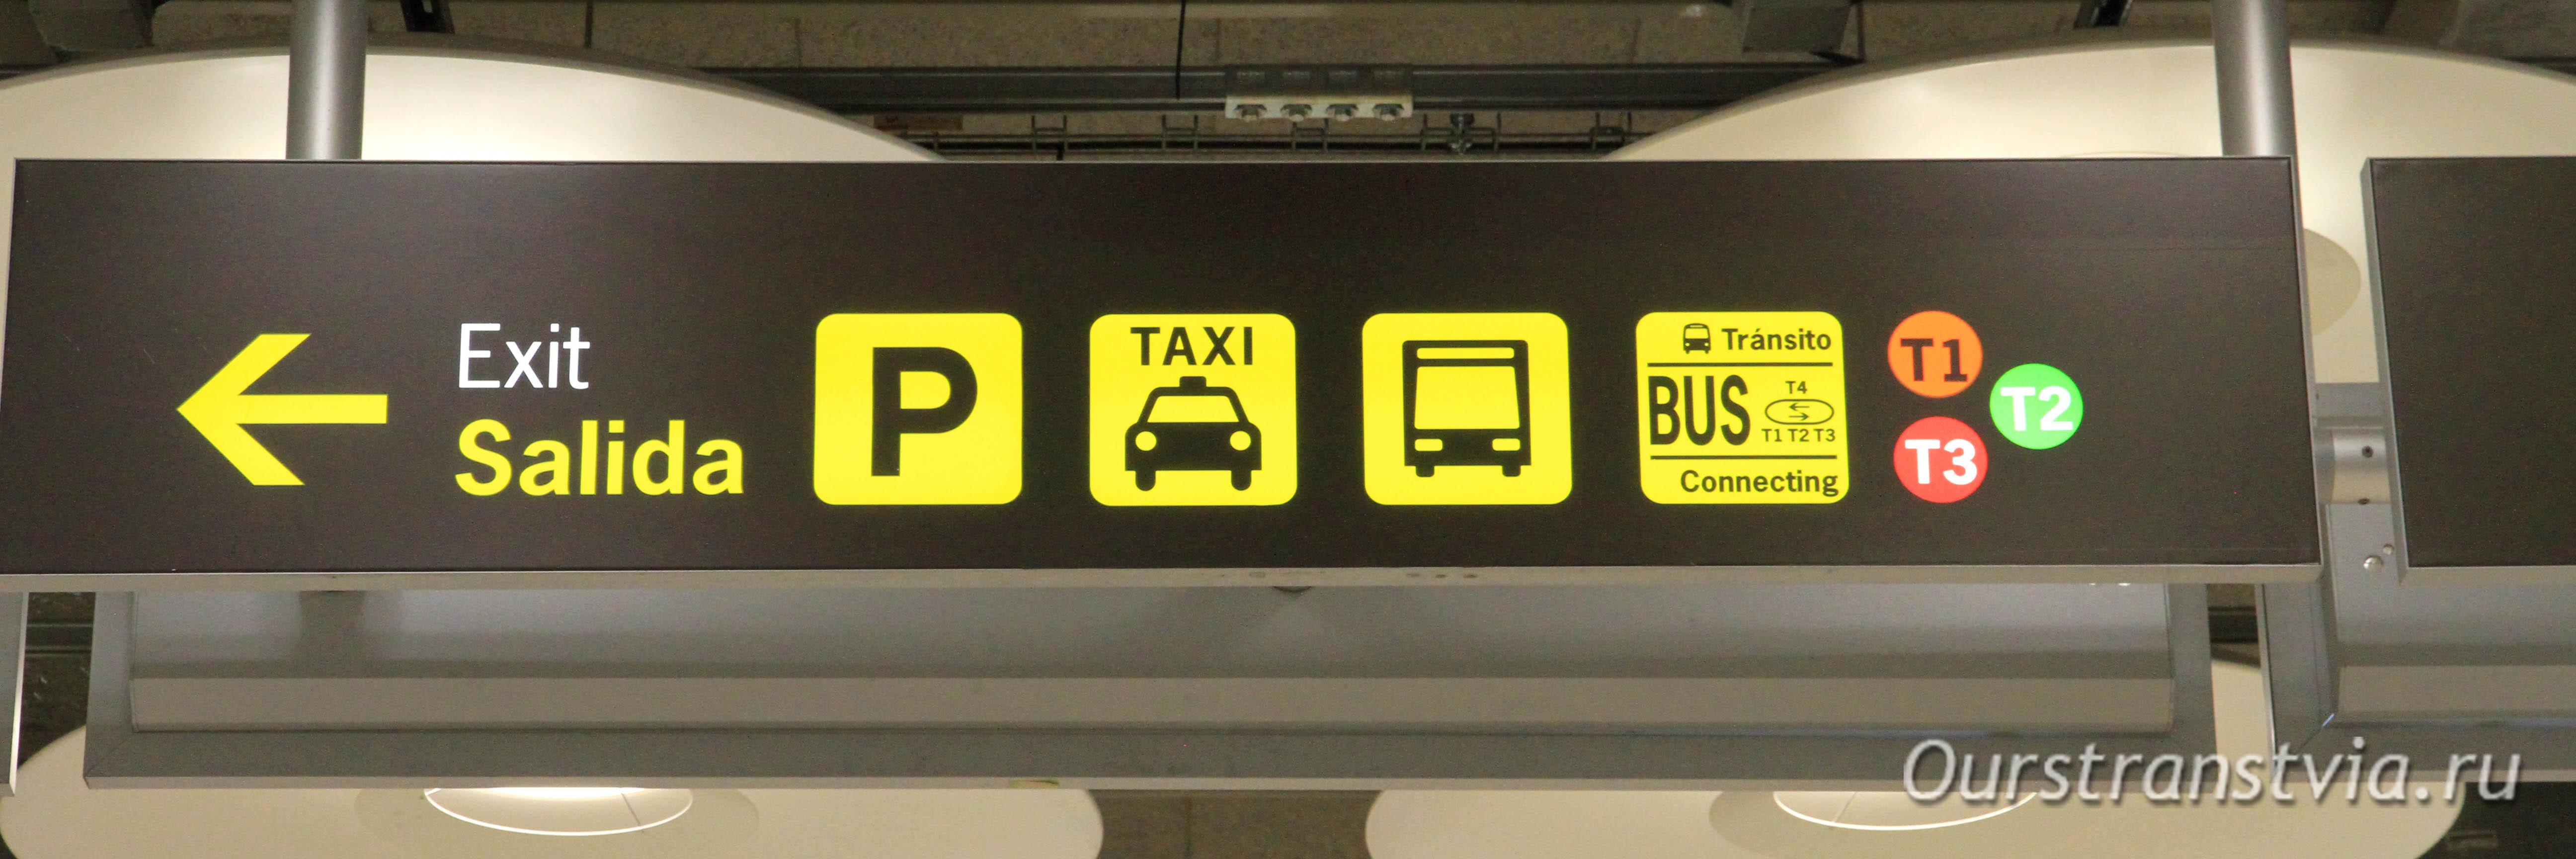 Указатели на автобус между терминалами Барахаса, аэропорт Мадрида